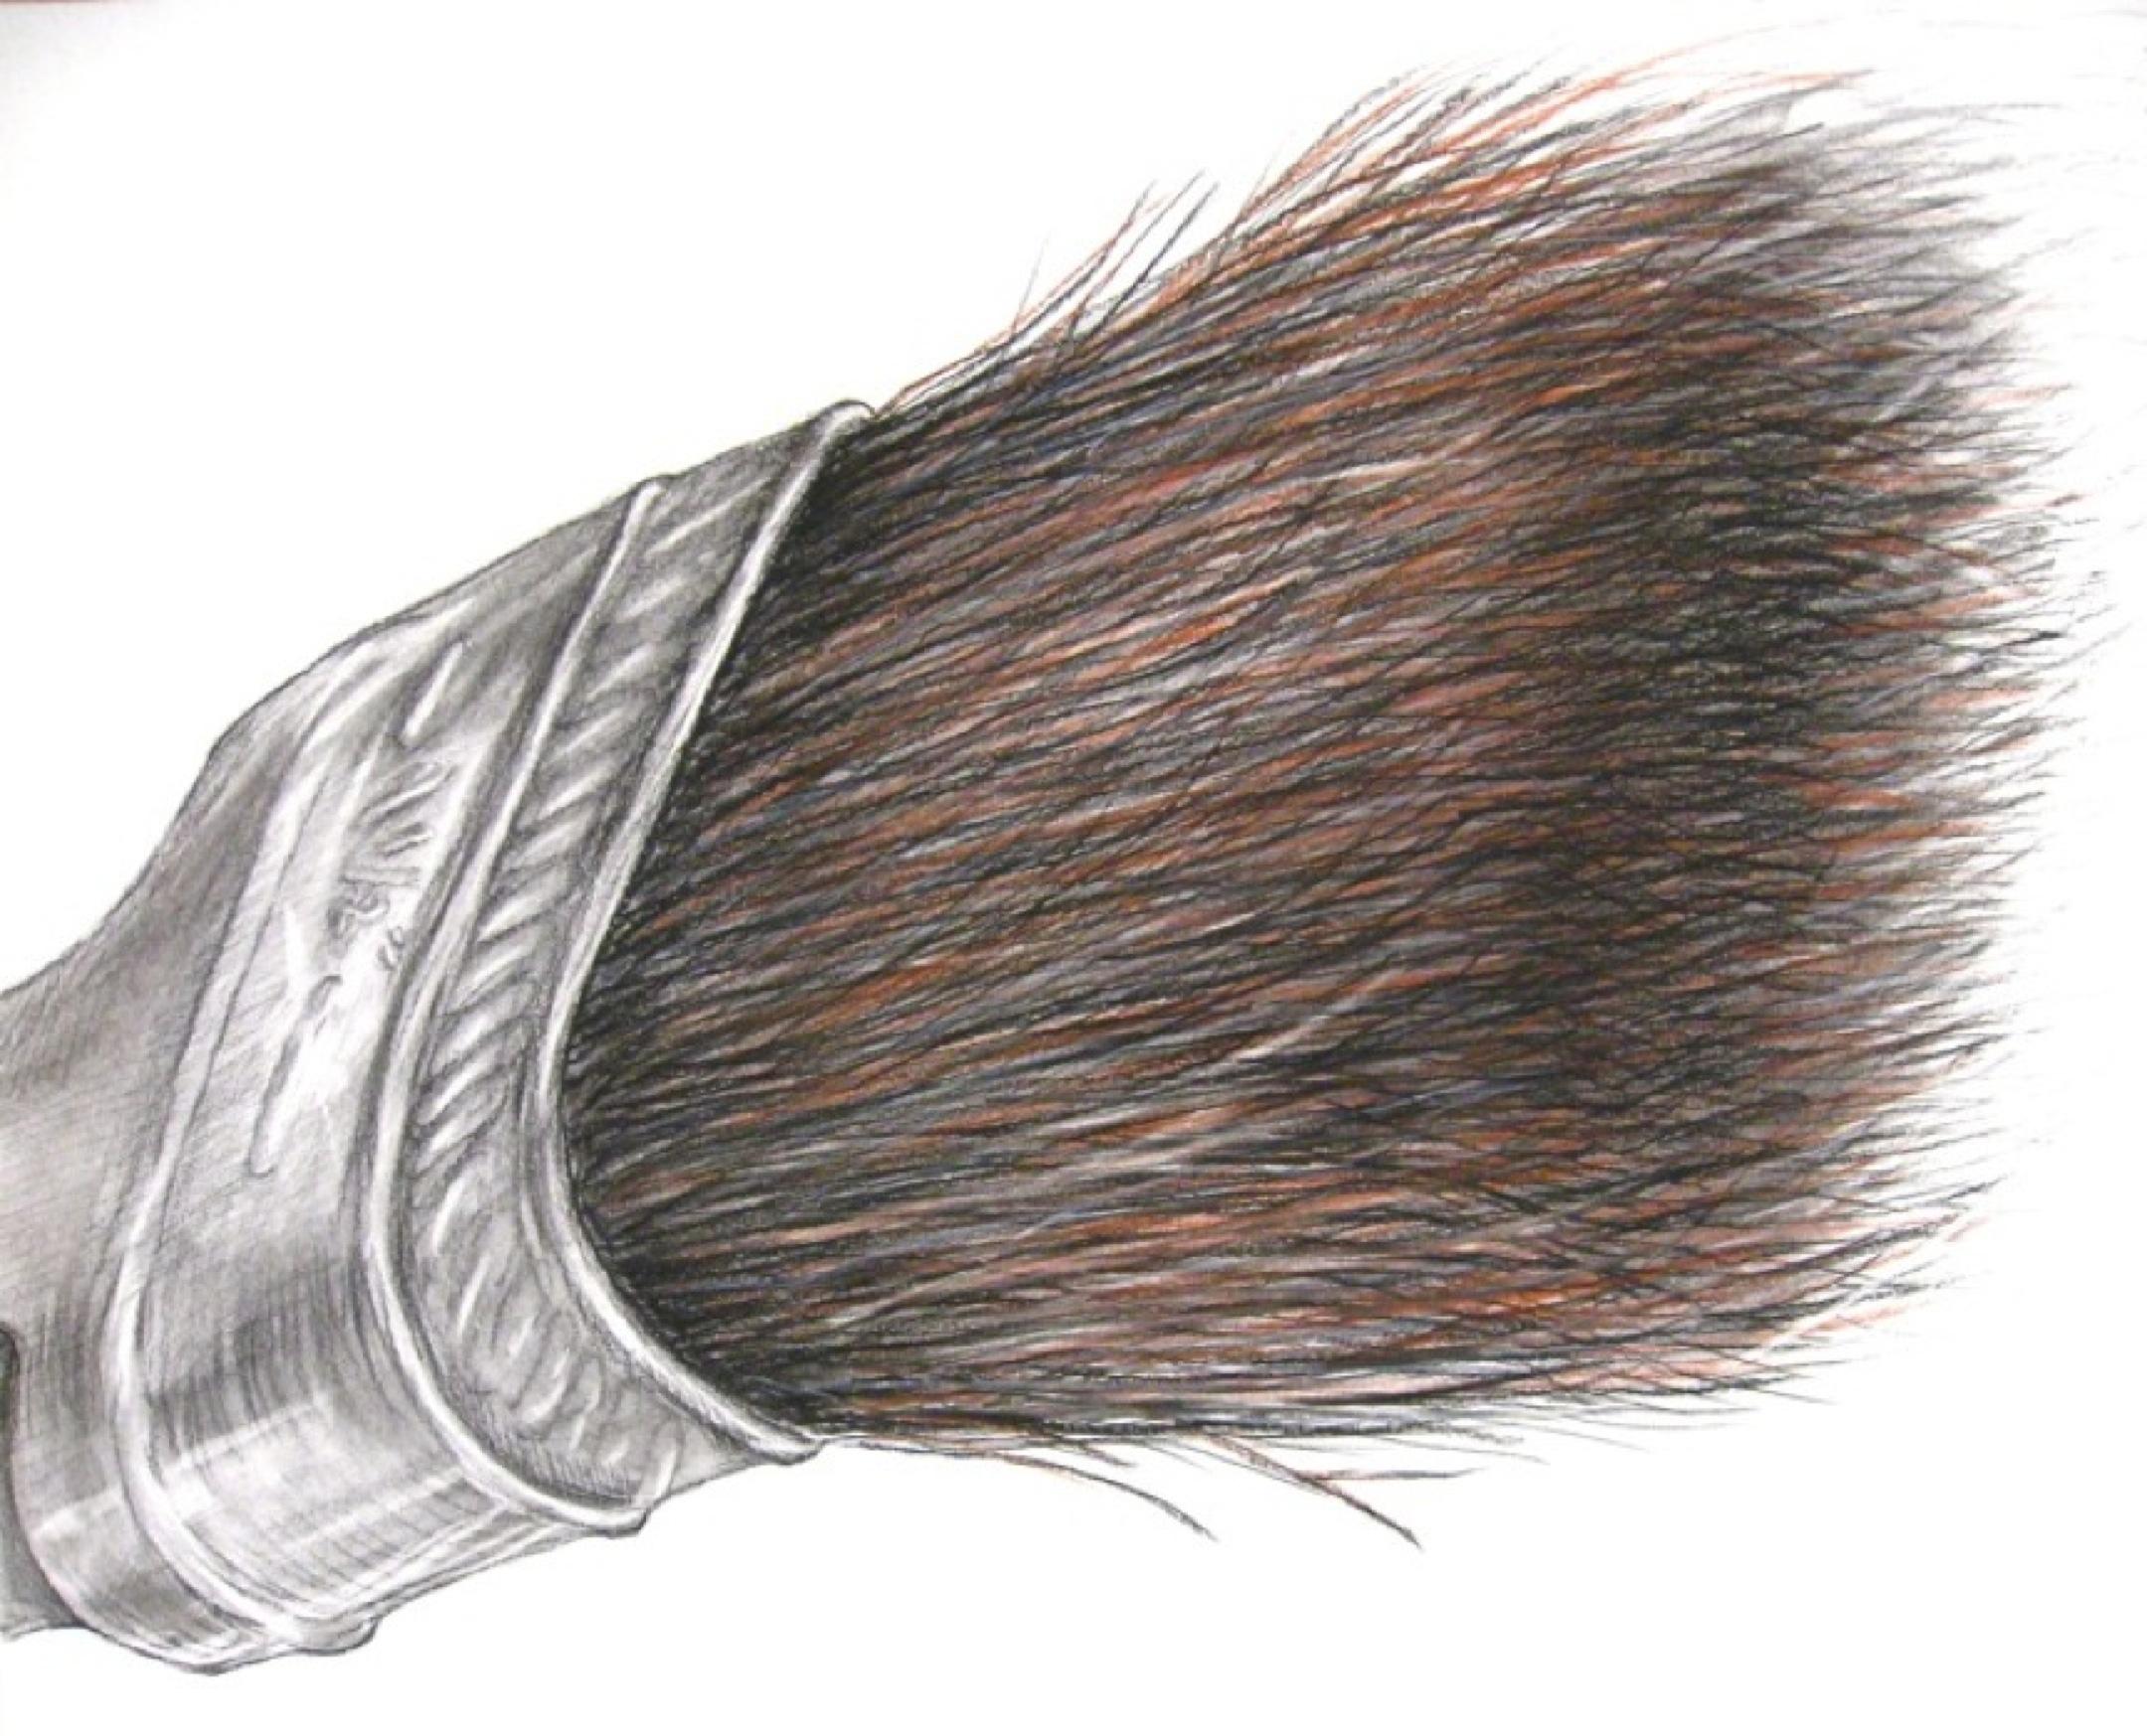 2160x1747 Student Drawing Paintbrush Magnification Philip Hazard